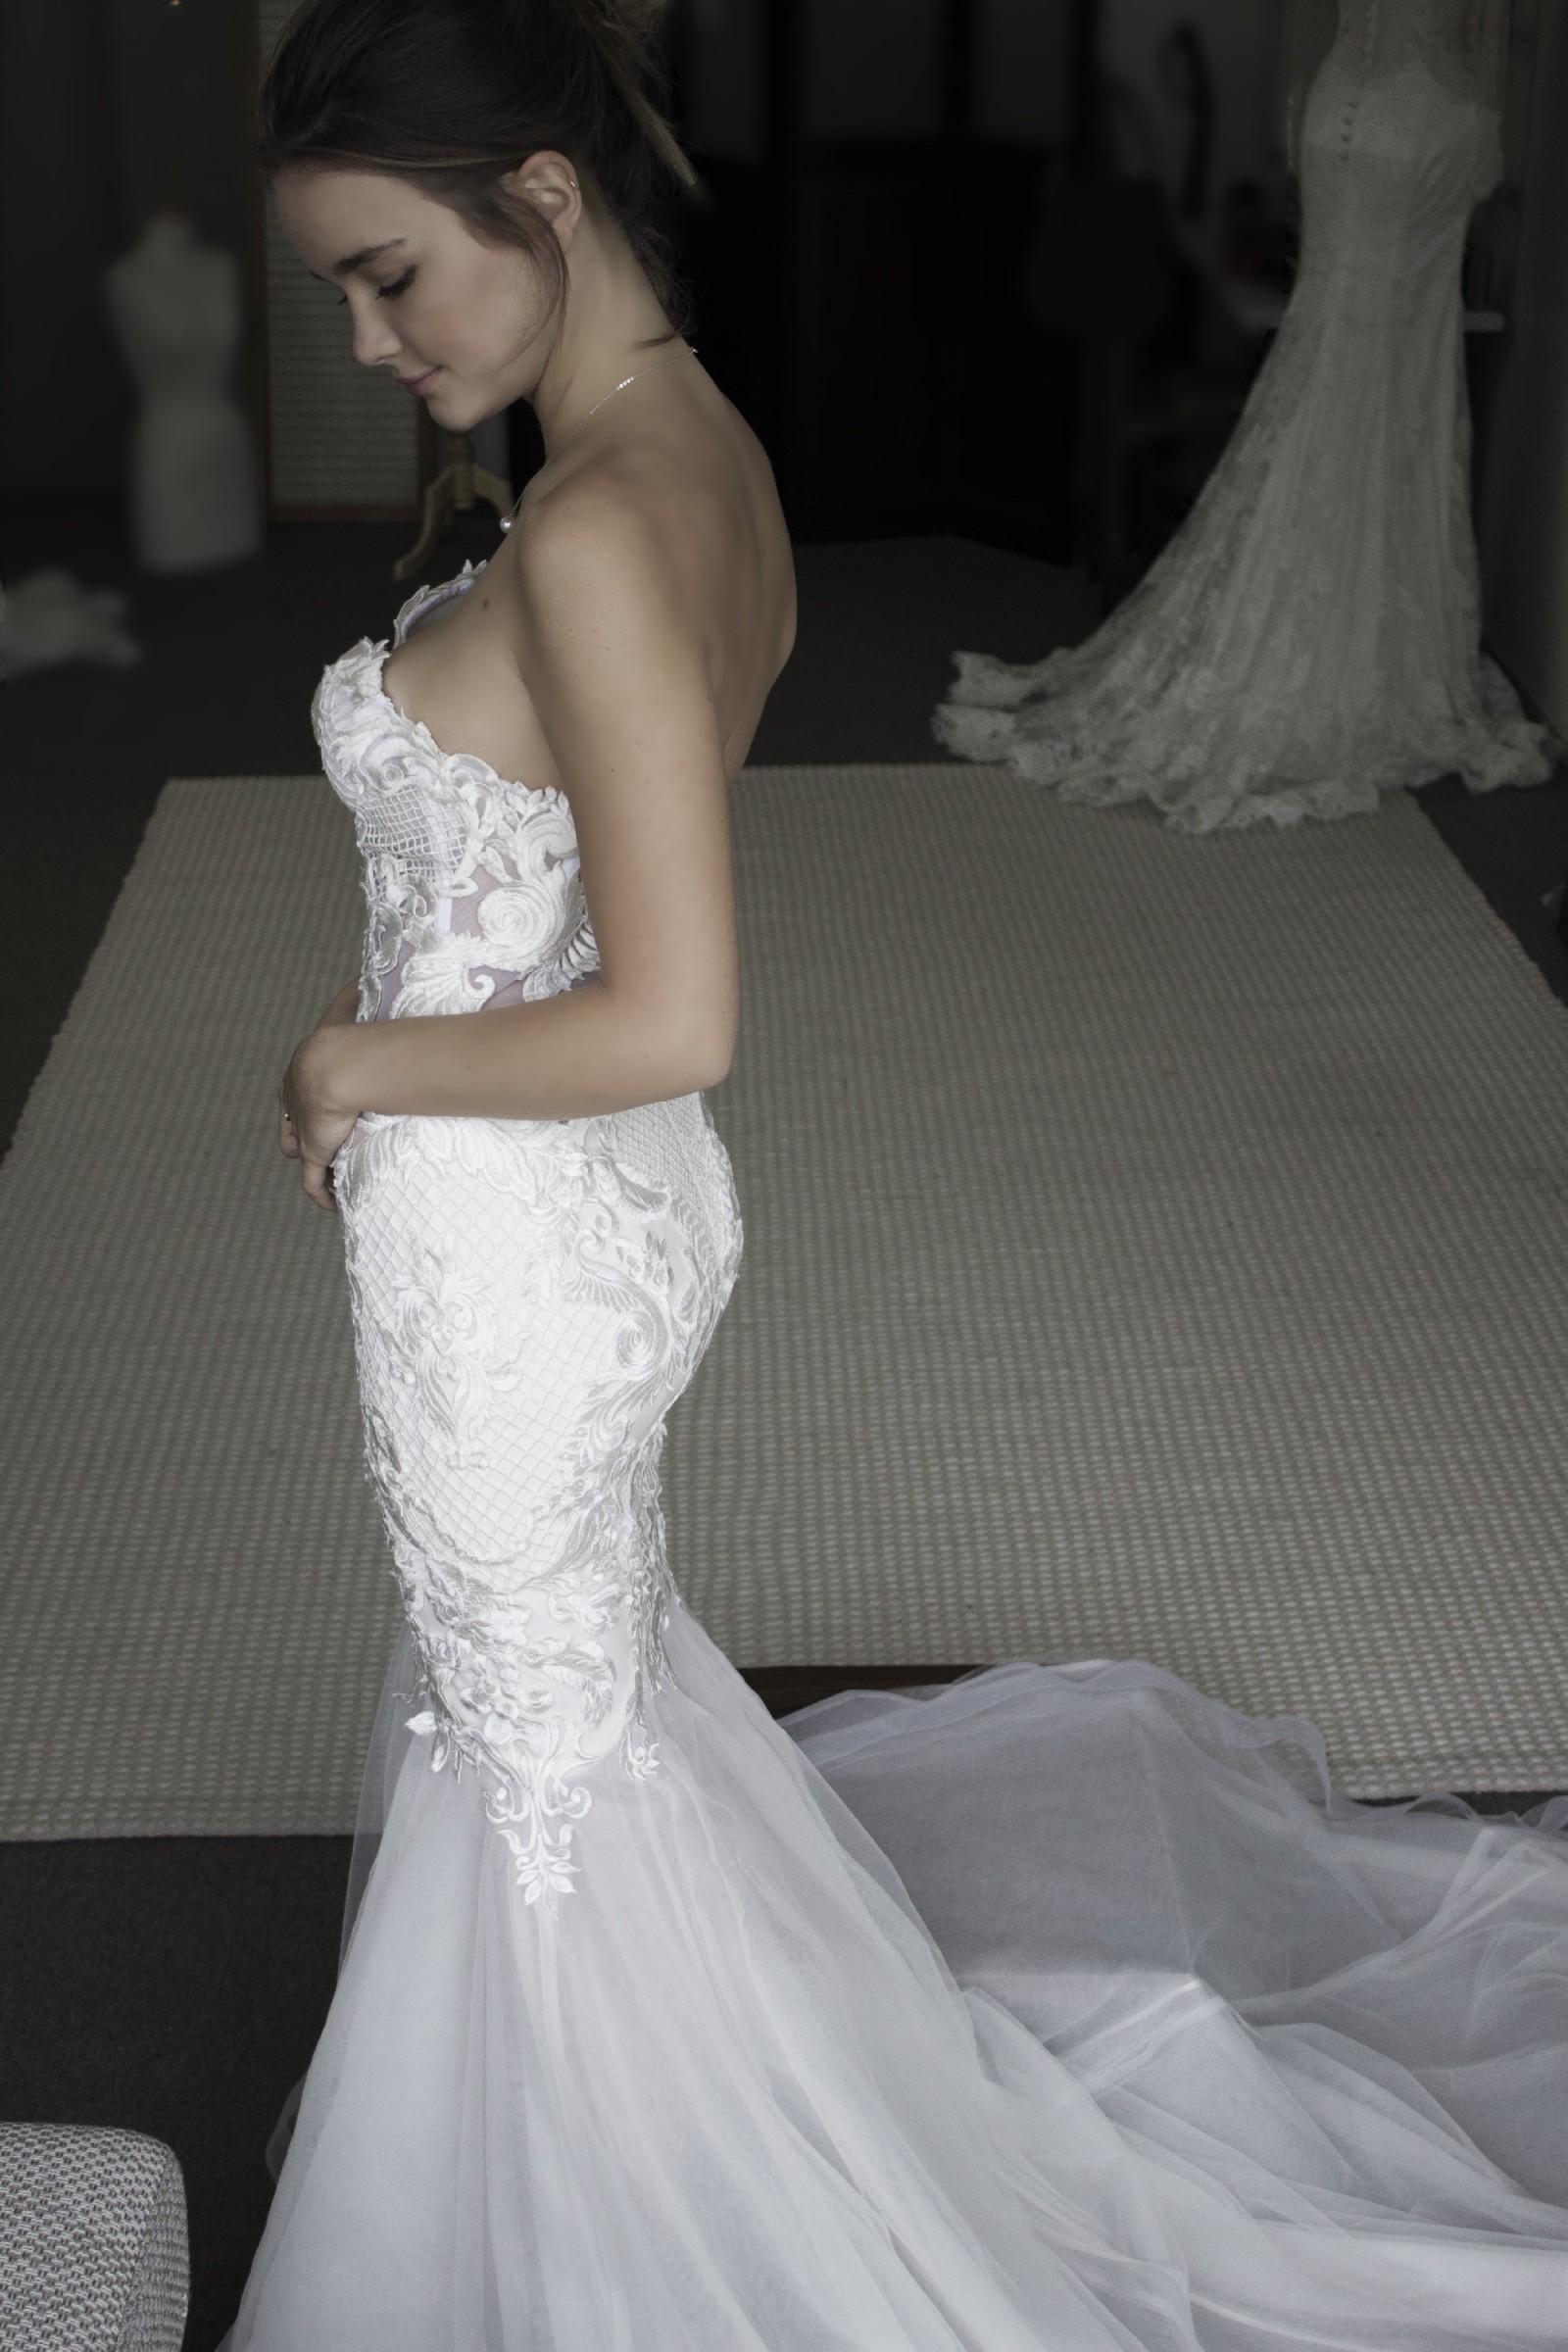 Blinova bridal sample wedding dress on sale 42 off for Wedding dress sample sale san francisco